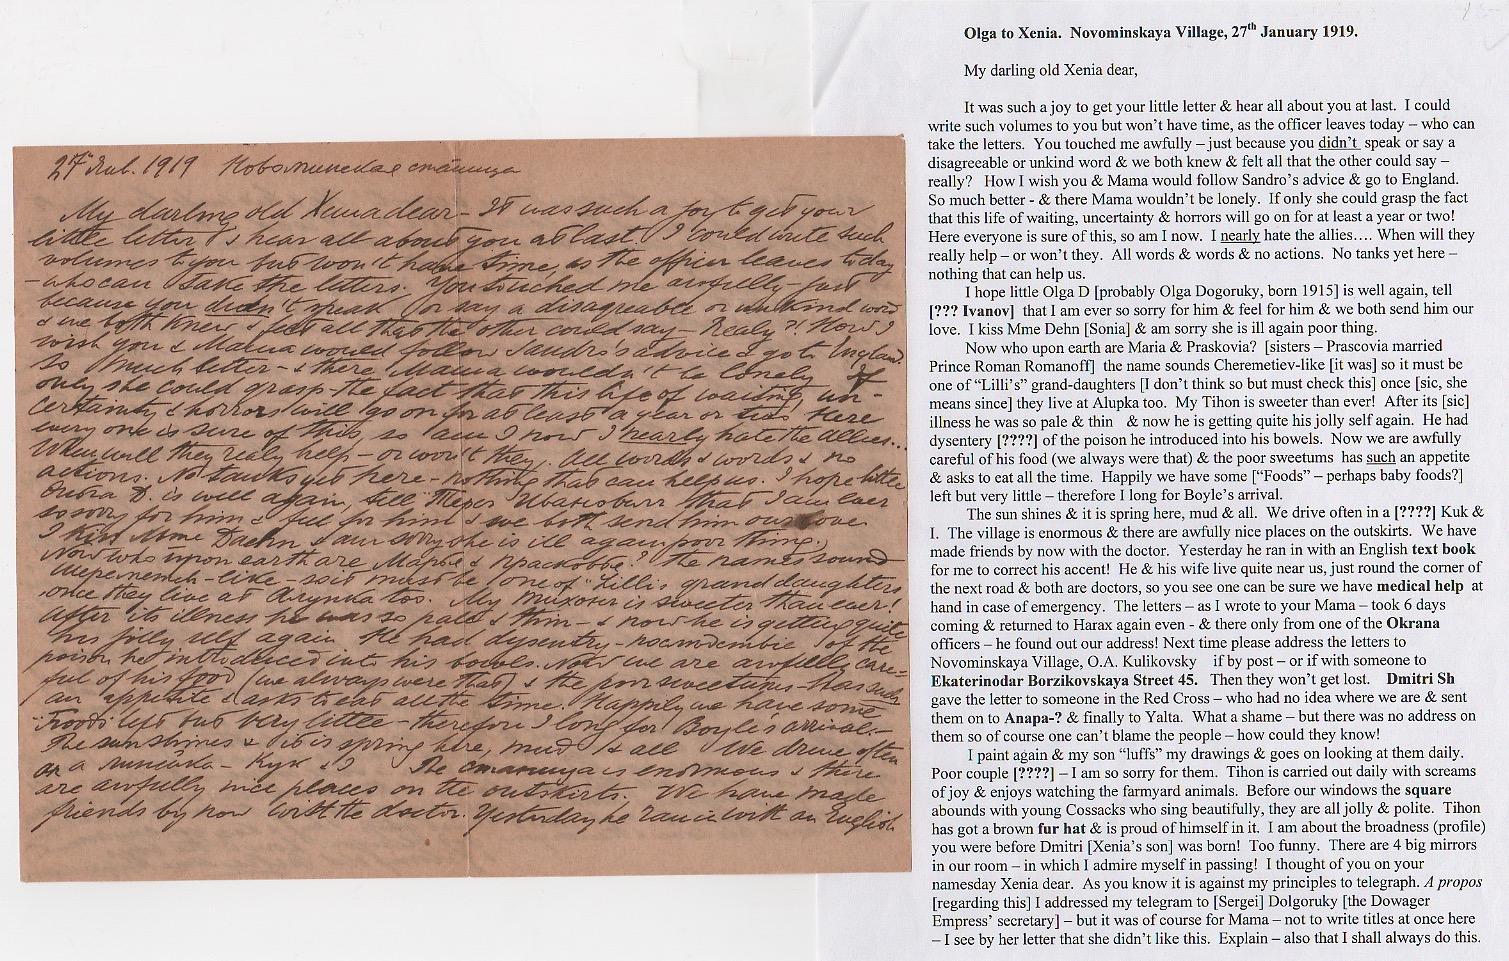 Royalty Grand Duchess Olga Correspondence To Her Sister Grand Duchess Xenia 1916-1920 - Image 14 of 47